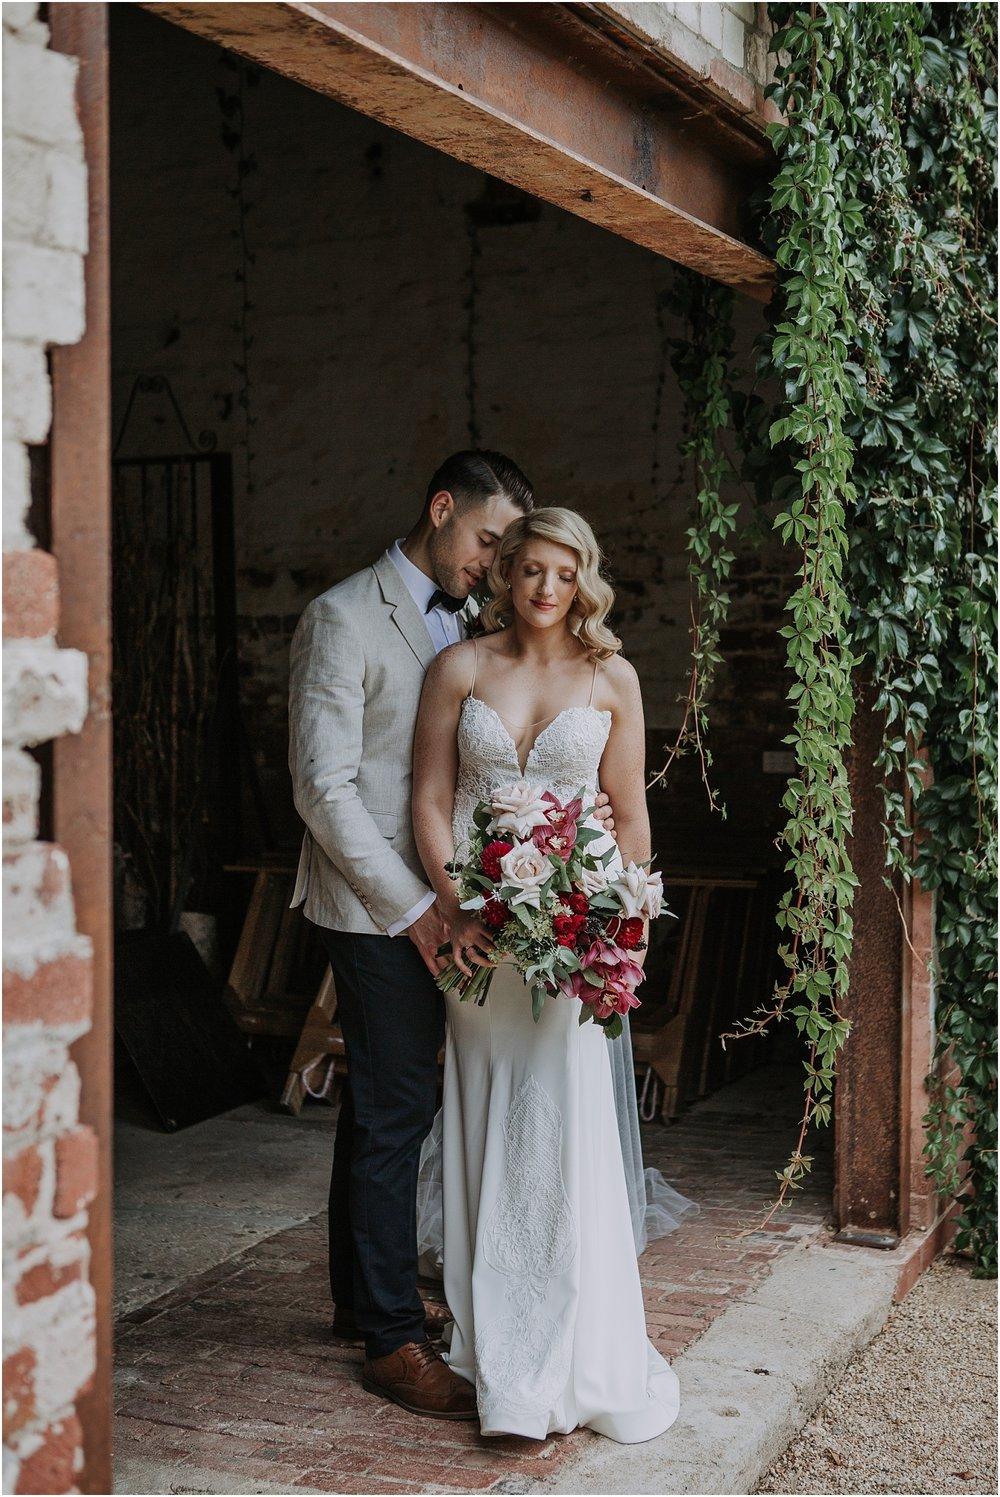 Katherine and Sam's stylish elopment at the Euroa Butter Factory._0066.jpg